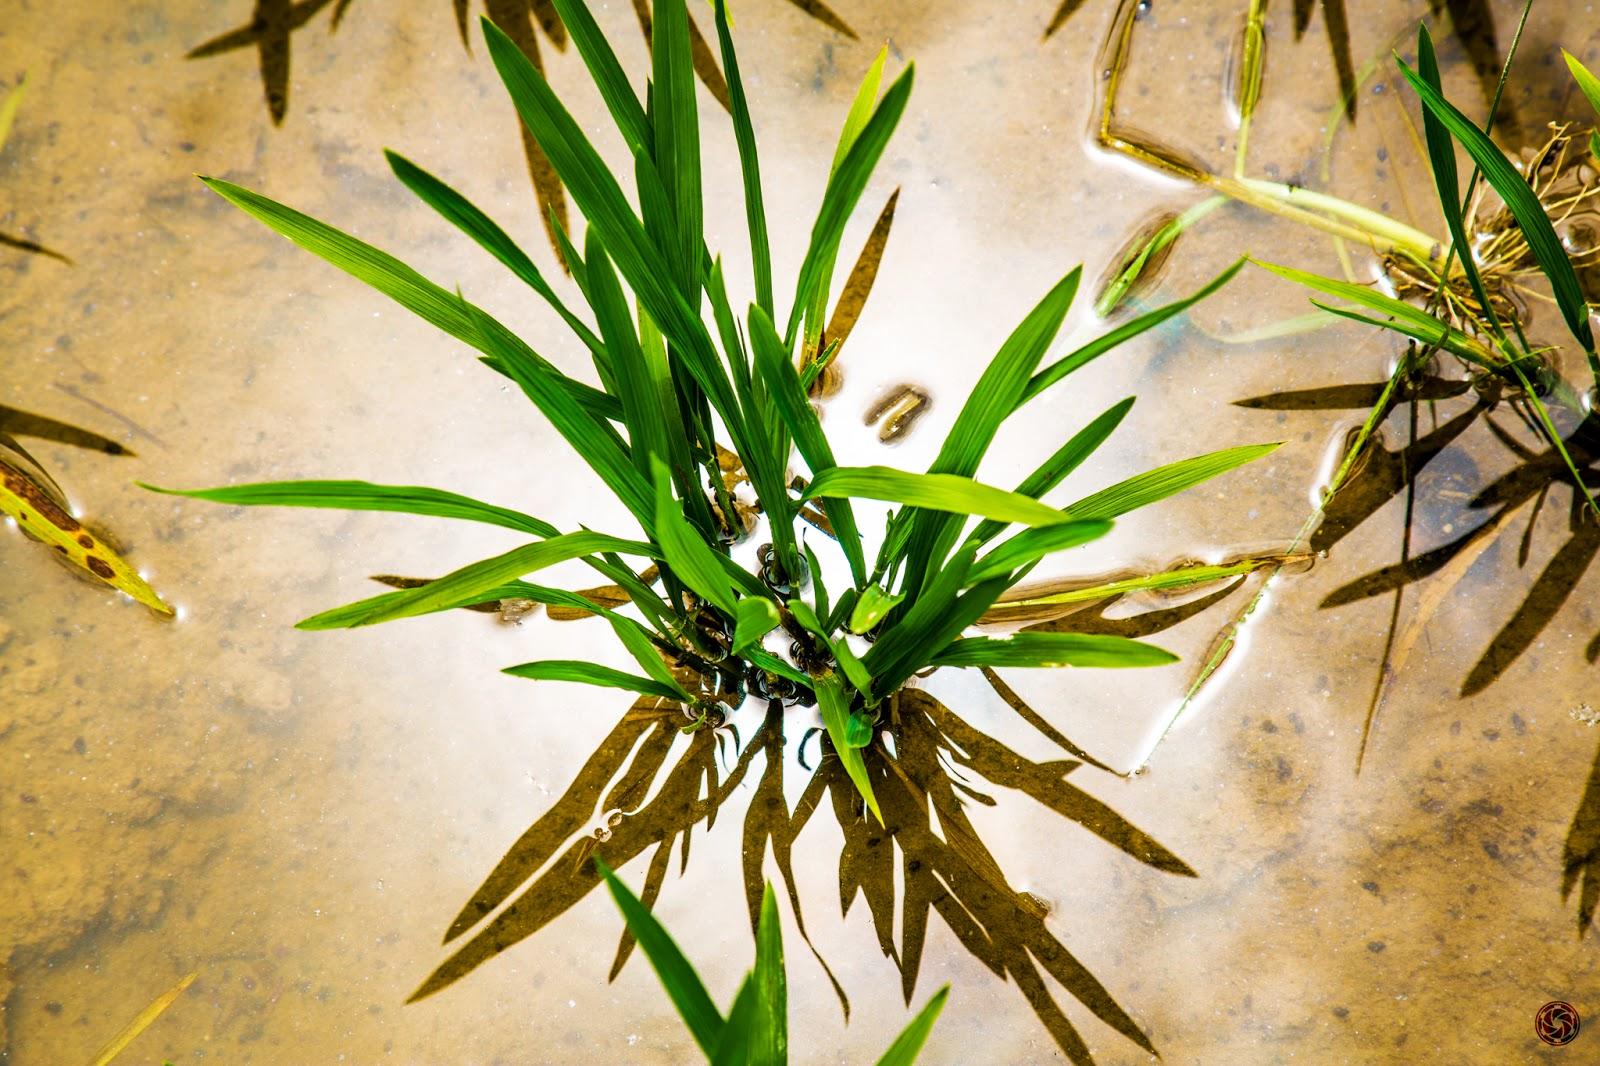 Planta :: Canon EOS 5D MkIII | ISO100 | Canon 24-105 @105mm | f/8 | 1/200s